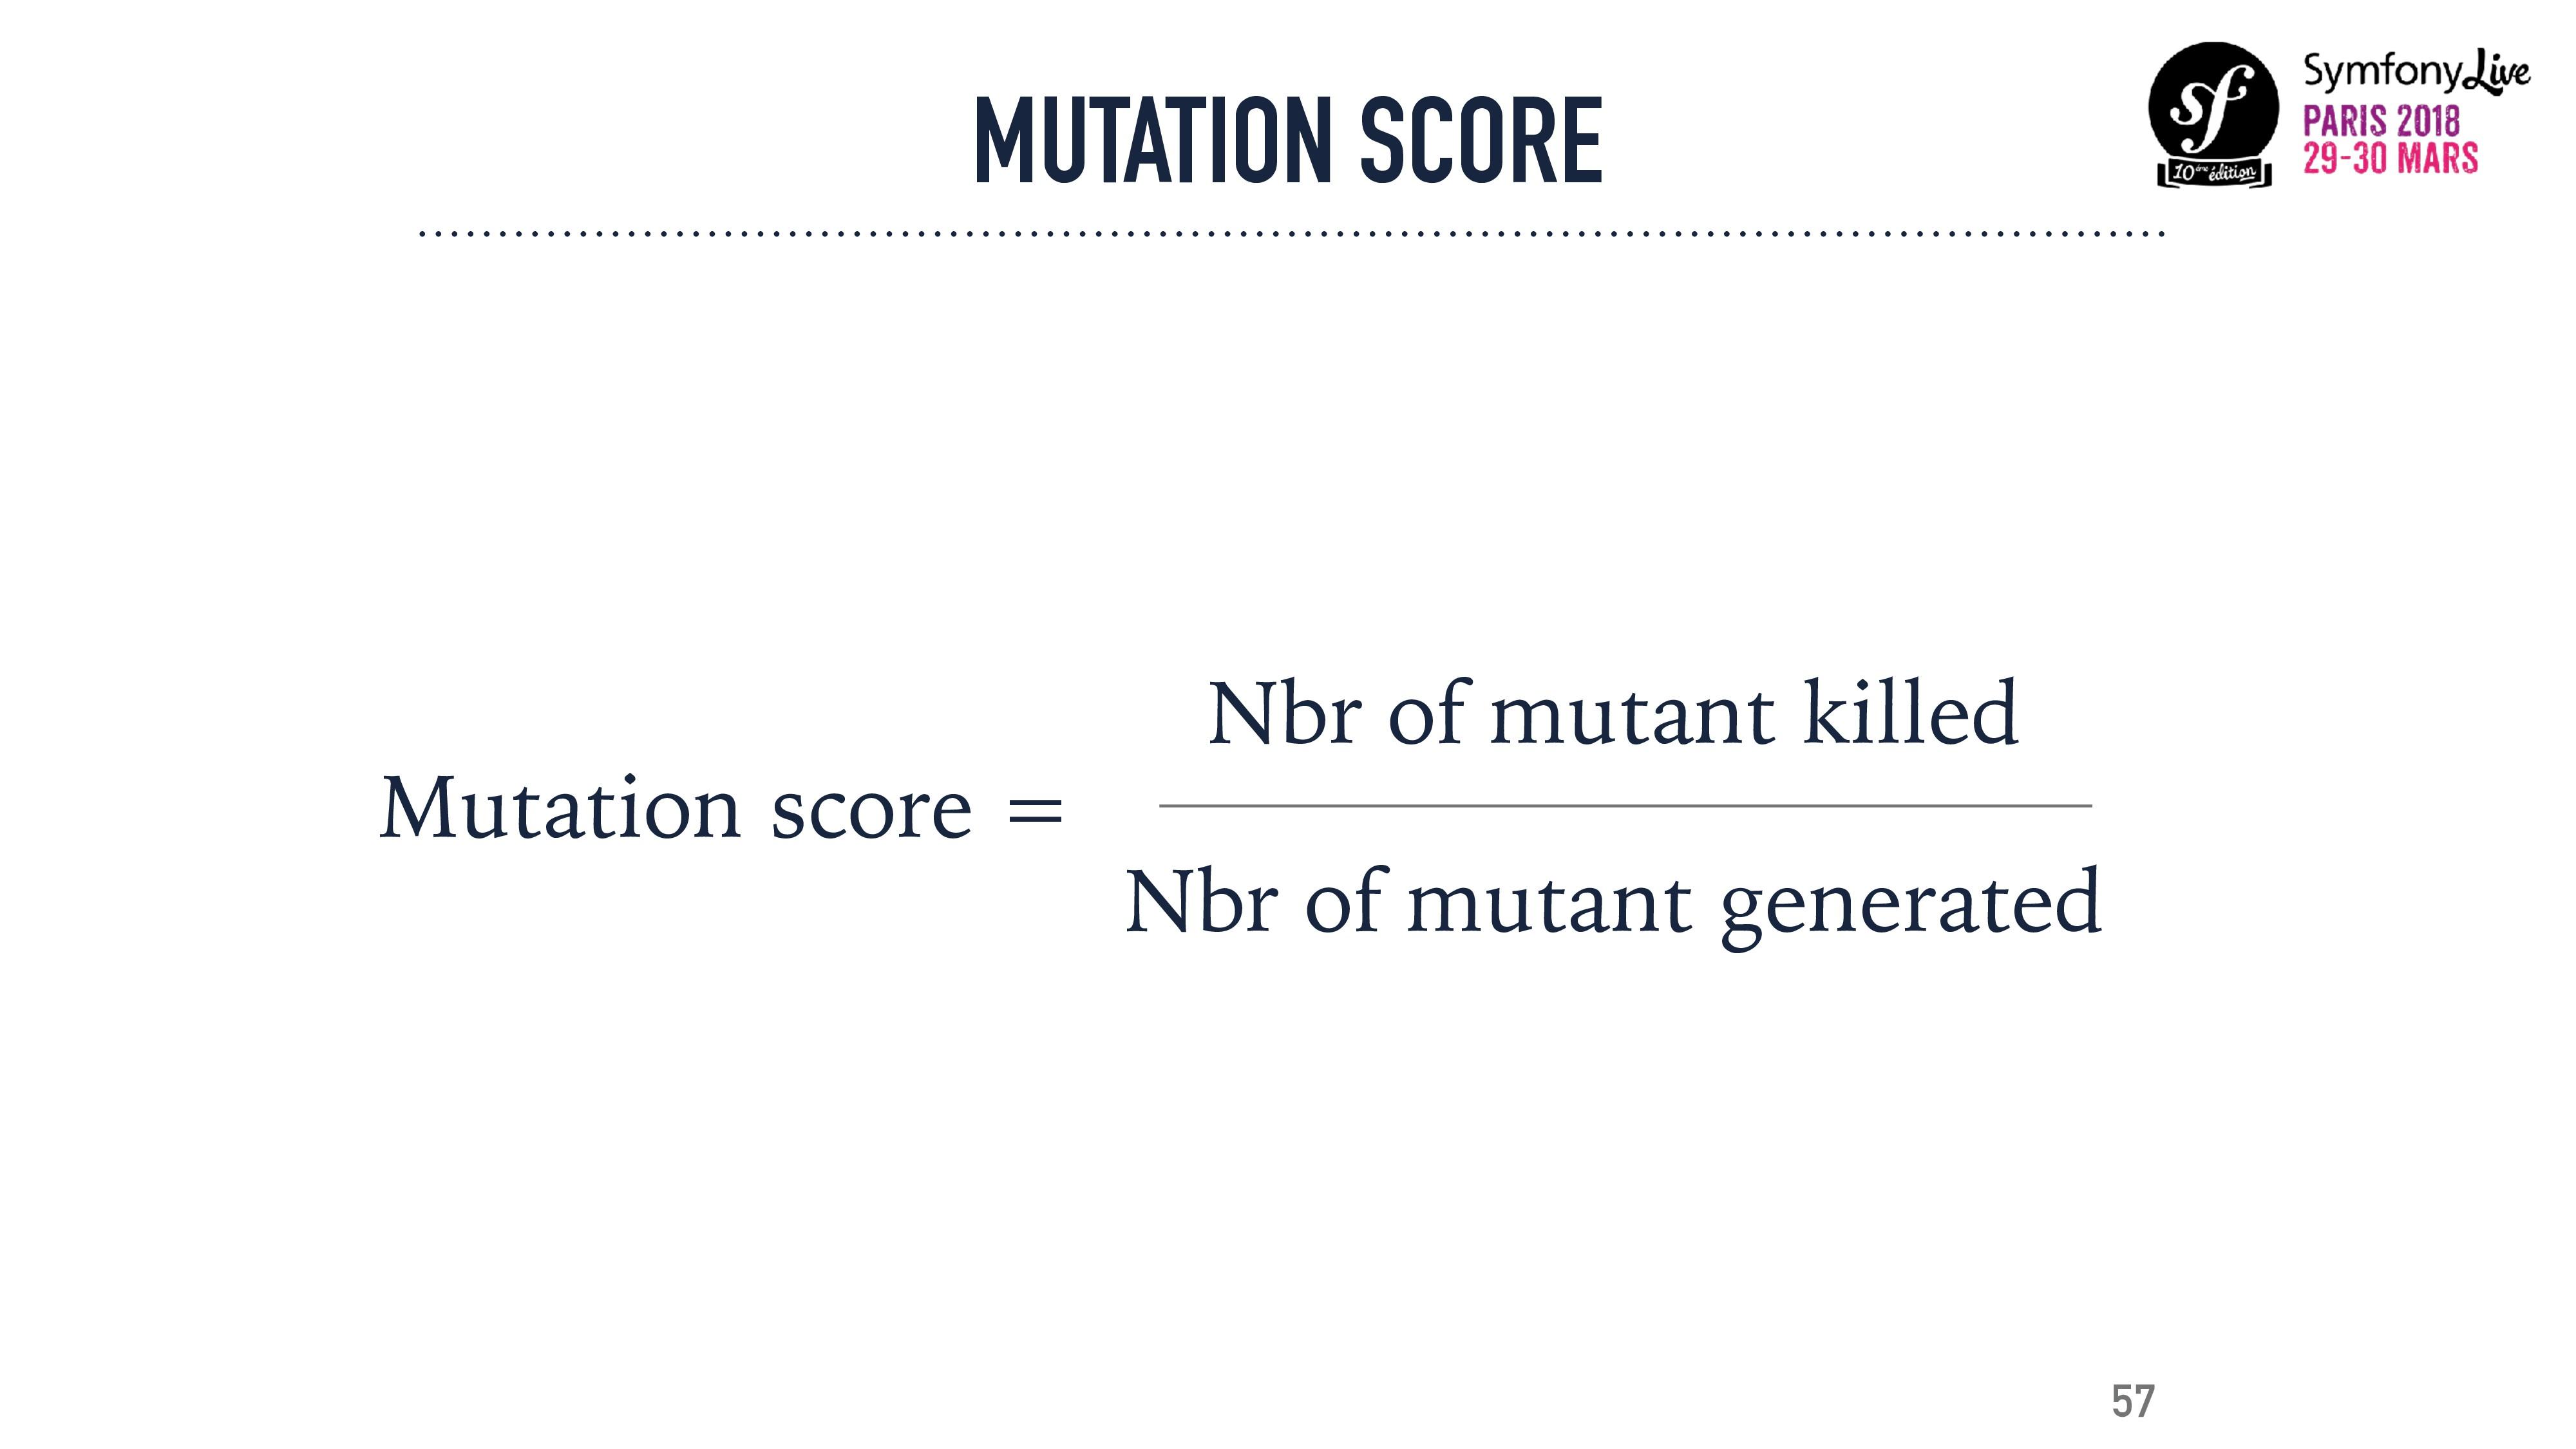 MUTATION SCORE Nbr of mutant killed Nbr of muta...